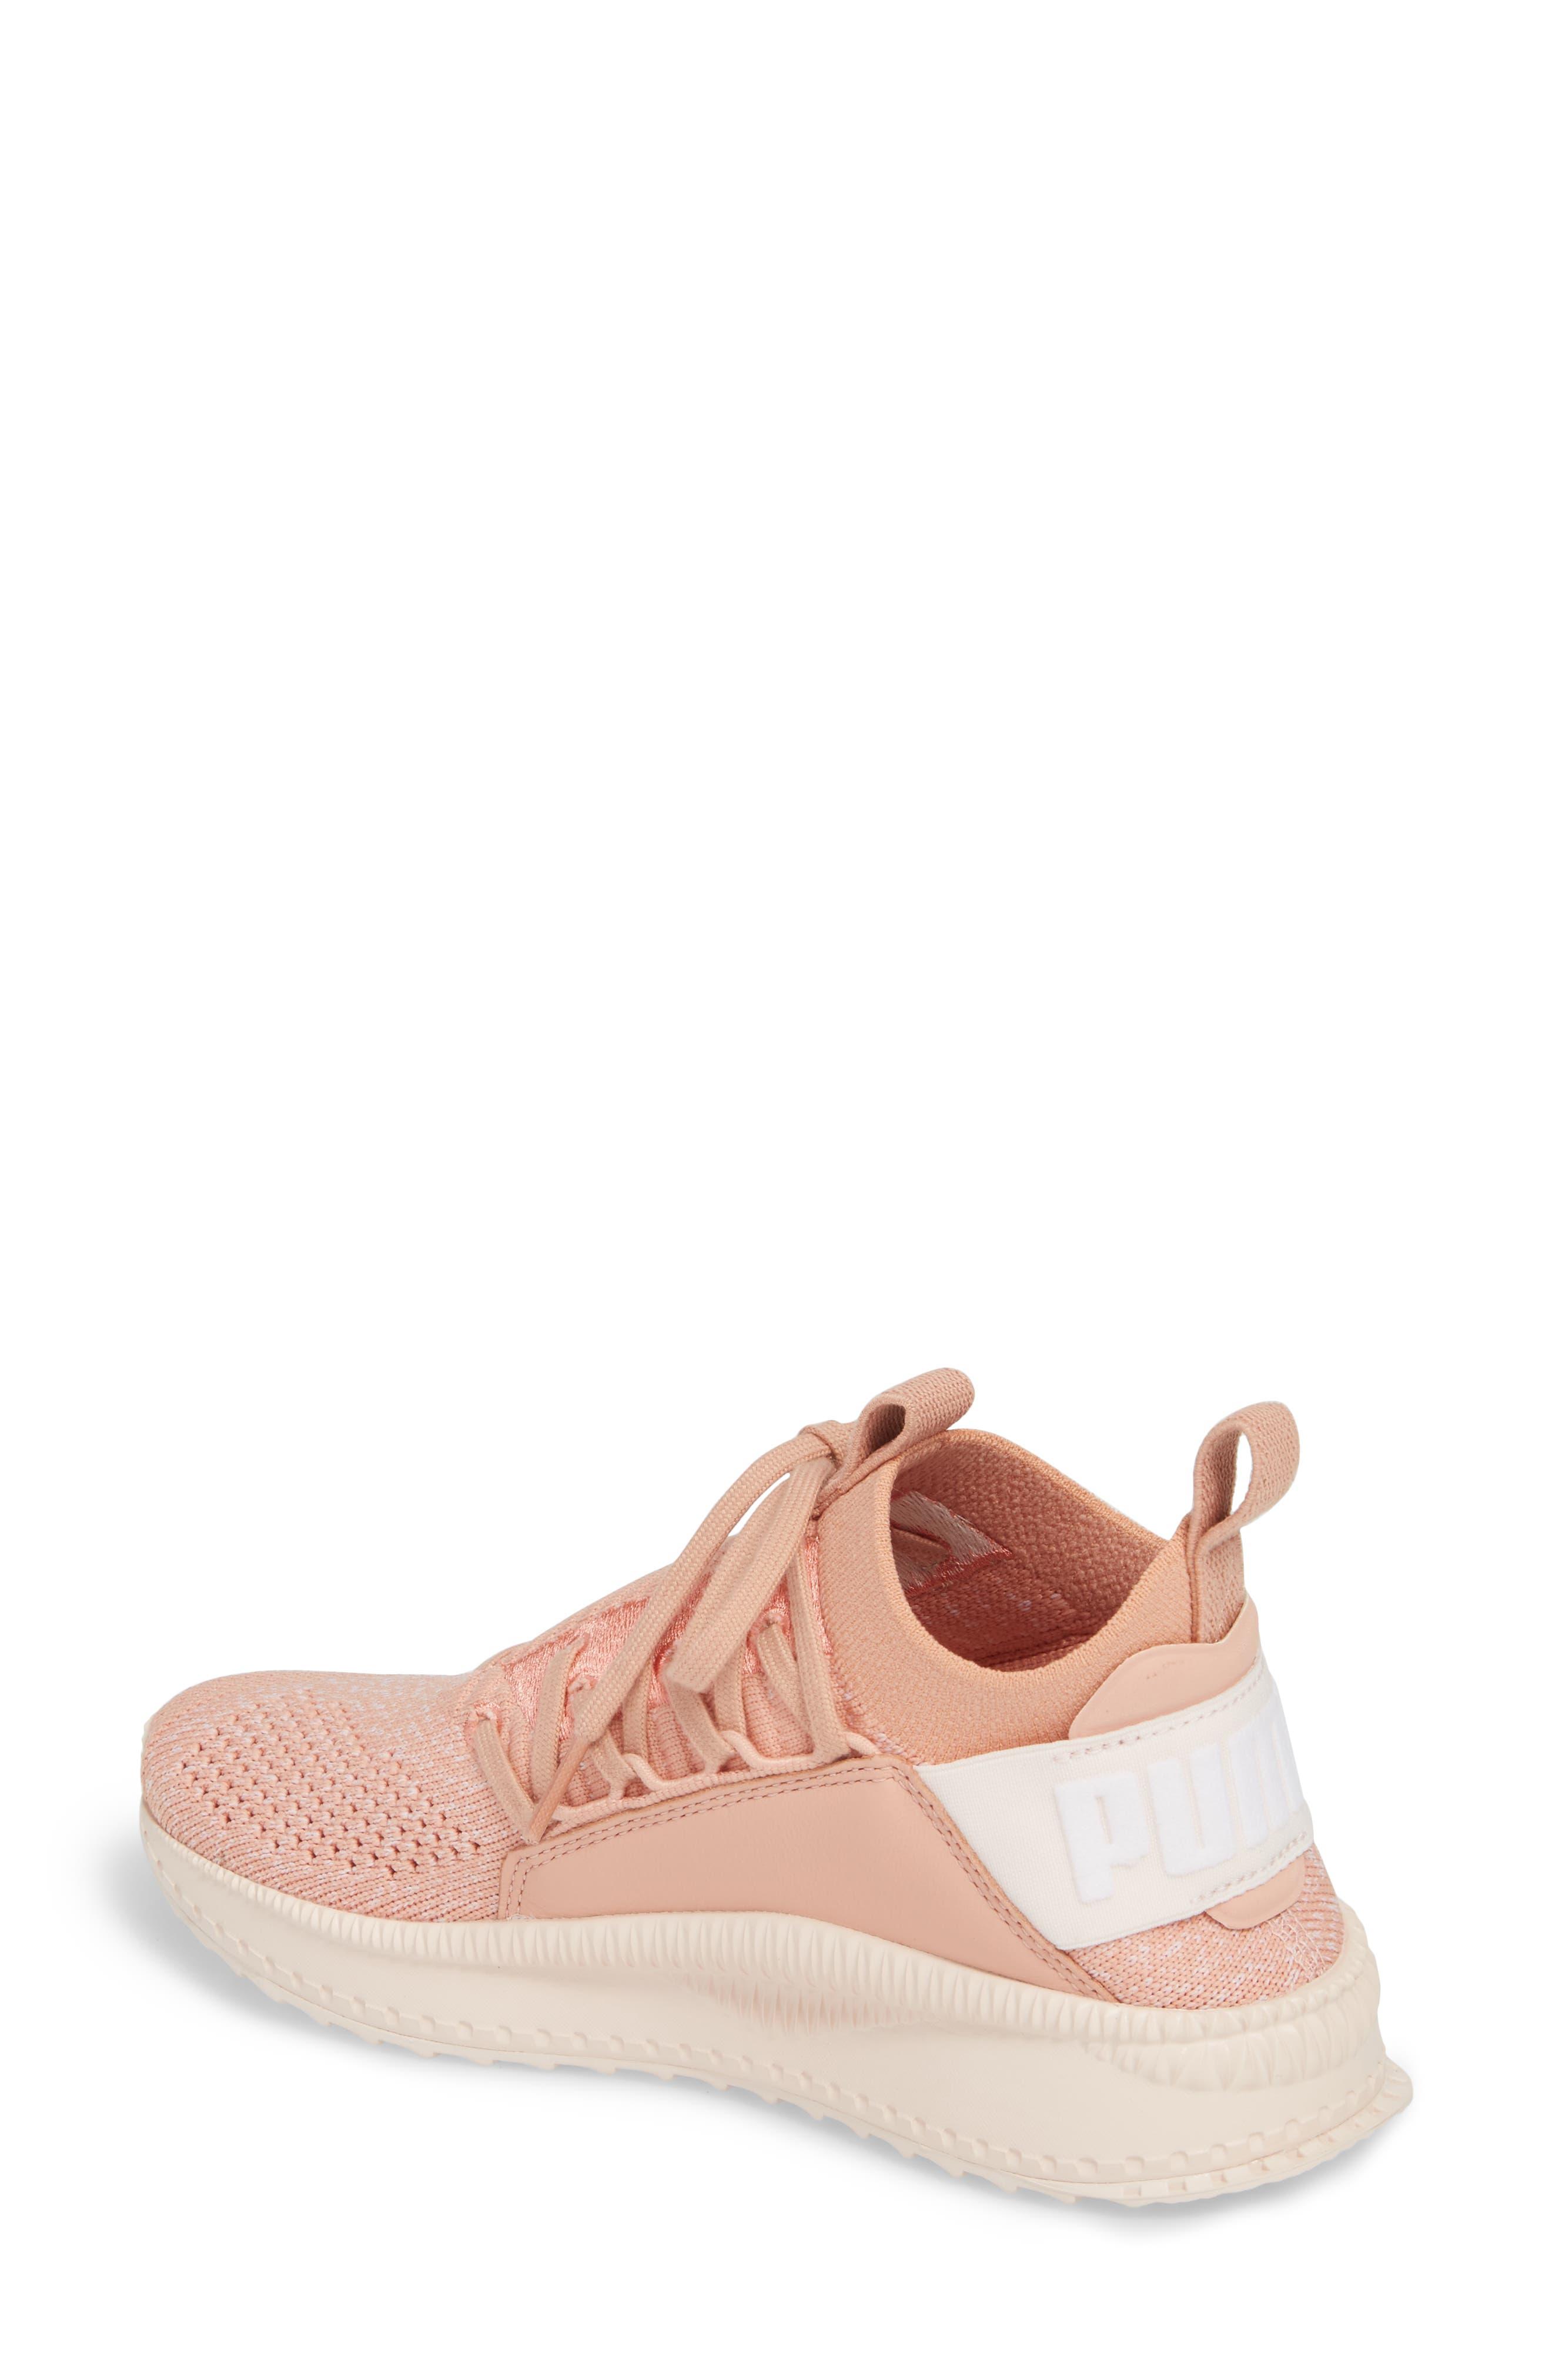 Tsugi Jun Knit Sneaker,                             Alternate thumbnail 2, color,                             Peach Beige/ Puma White/ Pearl